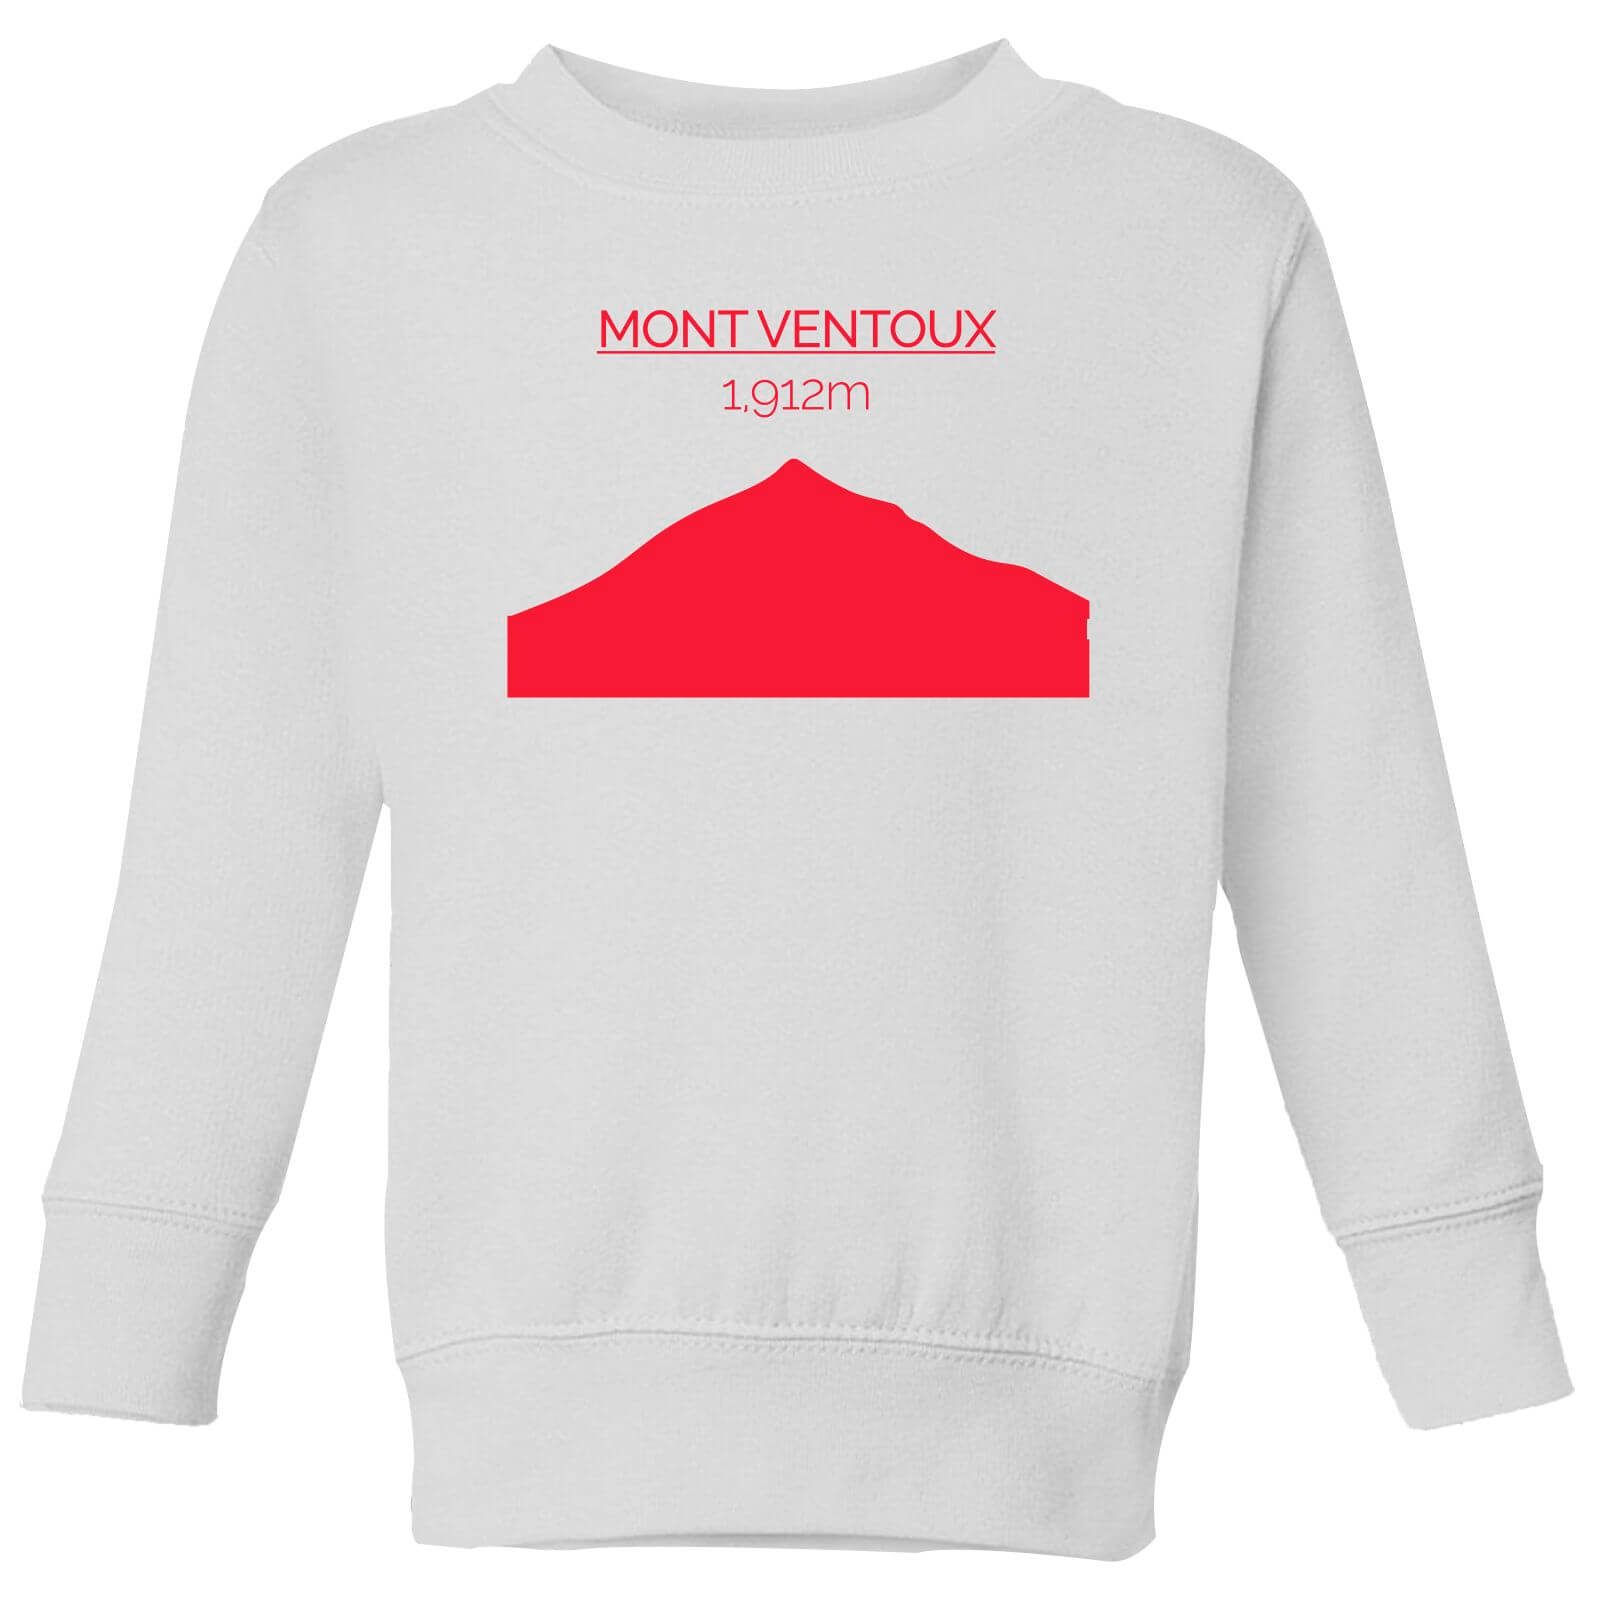 Summit Finish Mont Ventoux Kids' Sweatshirt - White - 11-12 Years - White